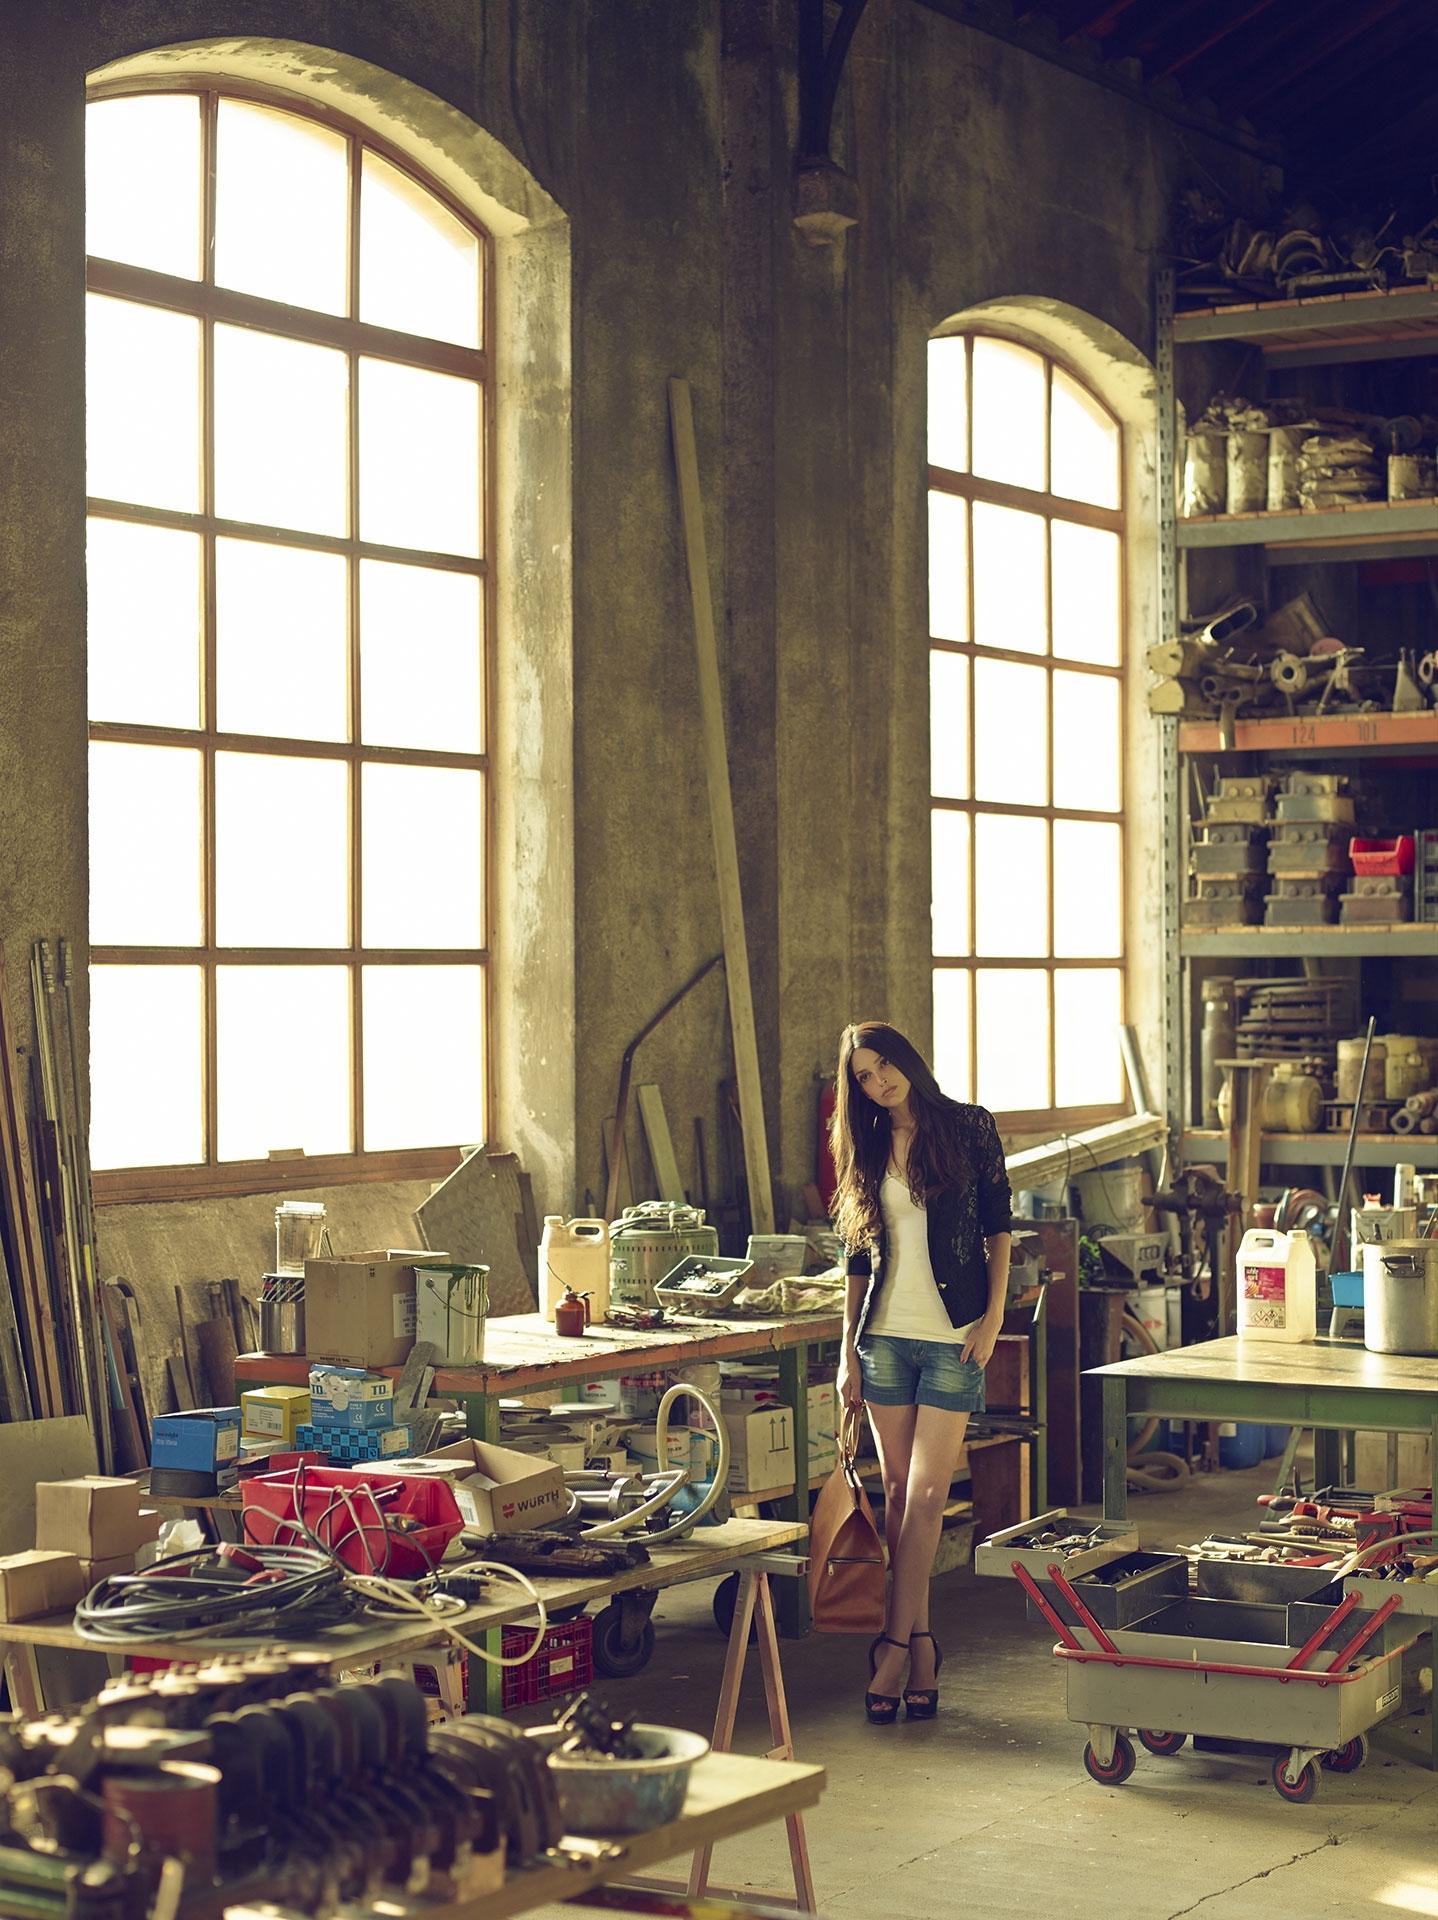 old train garage frederic mercier photographer edito lifestyle us american dream jean fashion one color